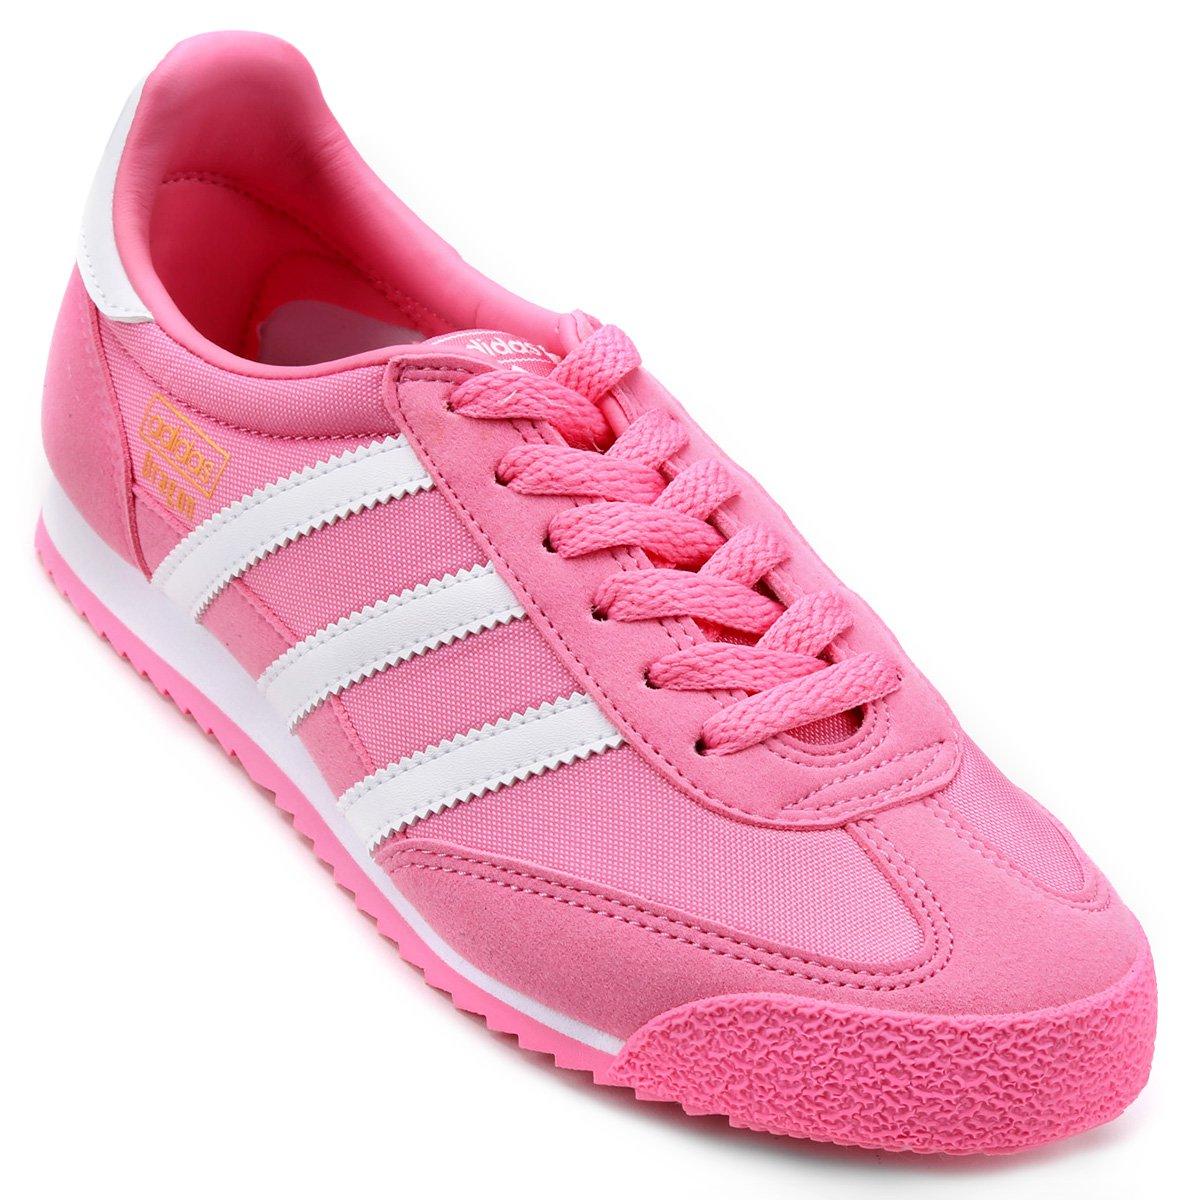 b51cf622d14 Tênis Adidas Dragon Og J Infantil - Rosa - Compre Agora